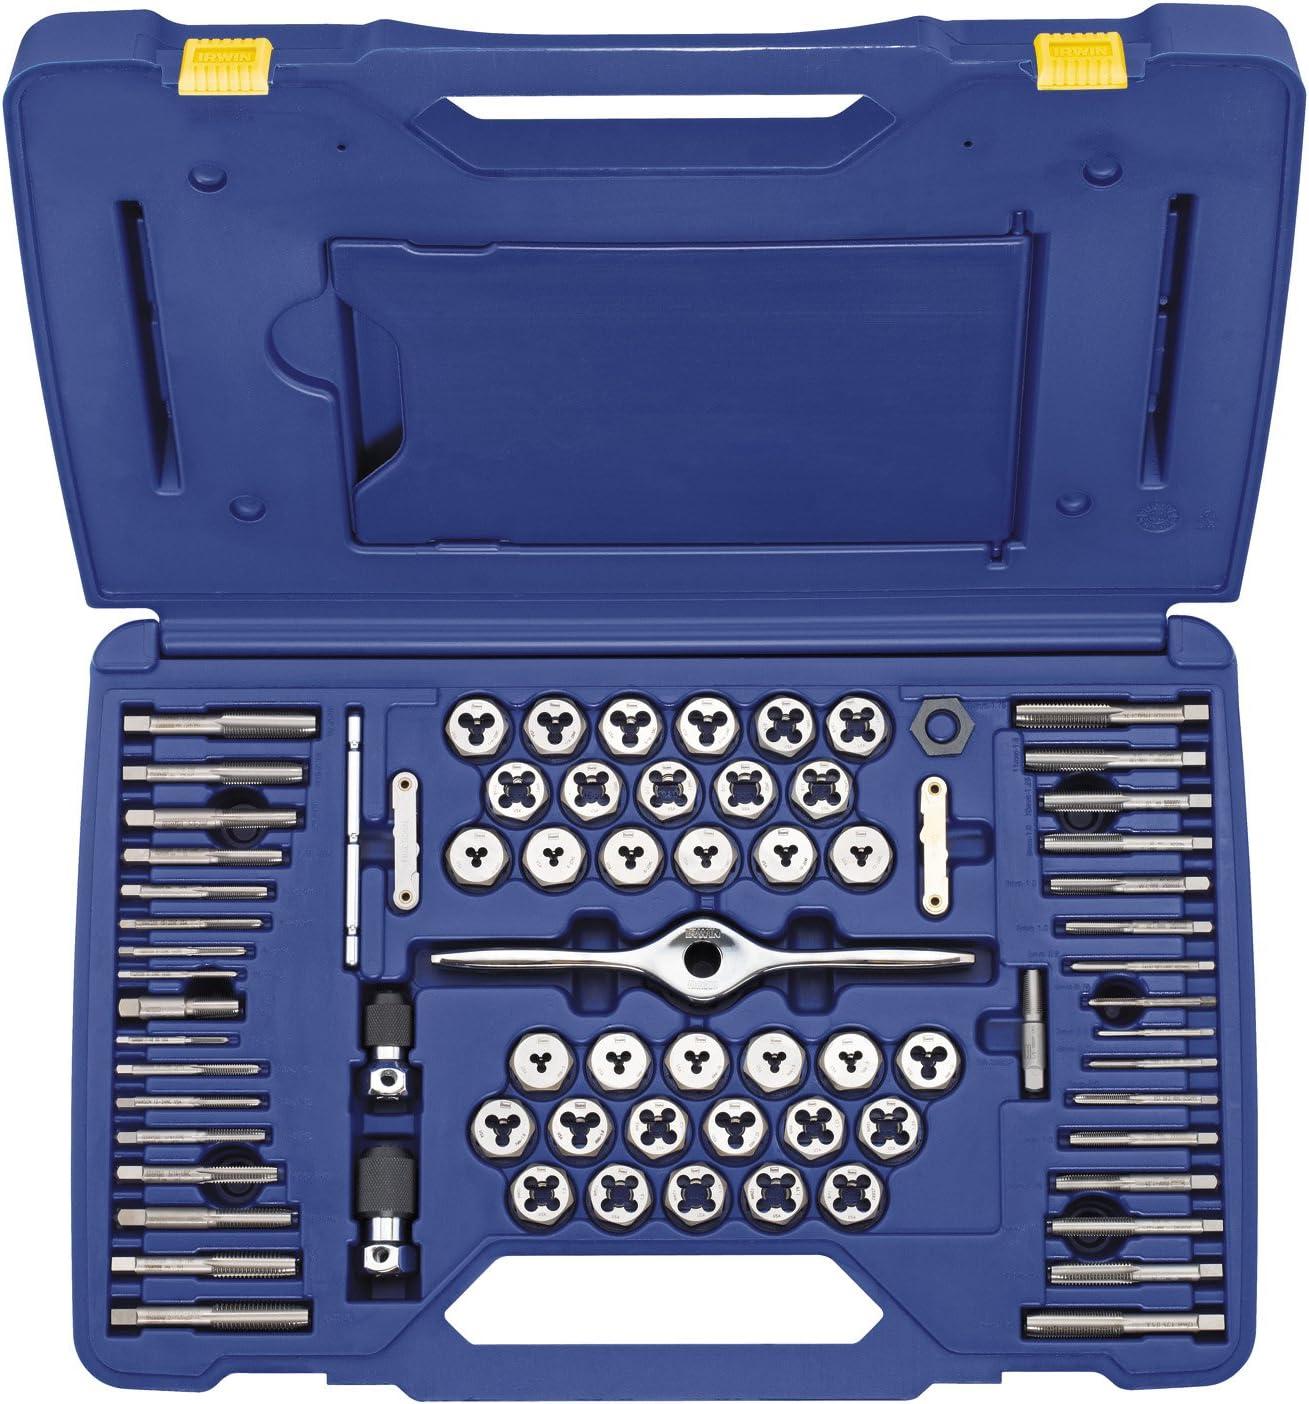 Small Product Image of IRWIN HANSON 1813816